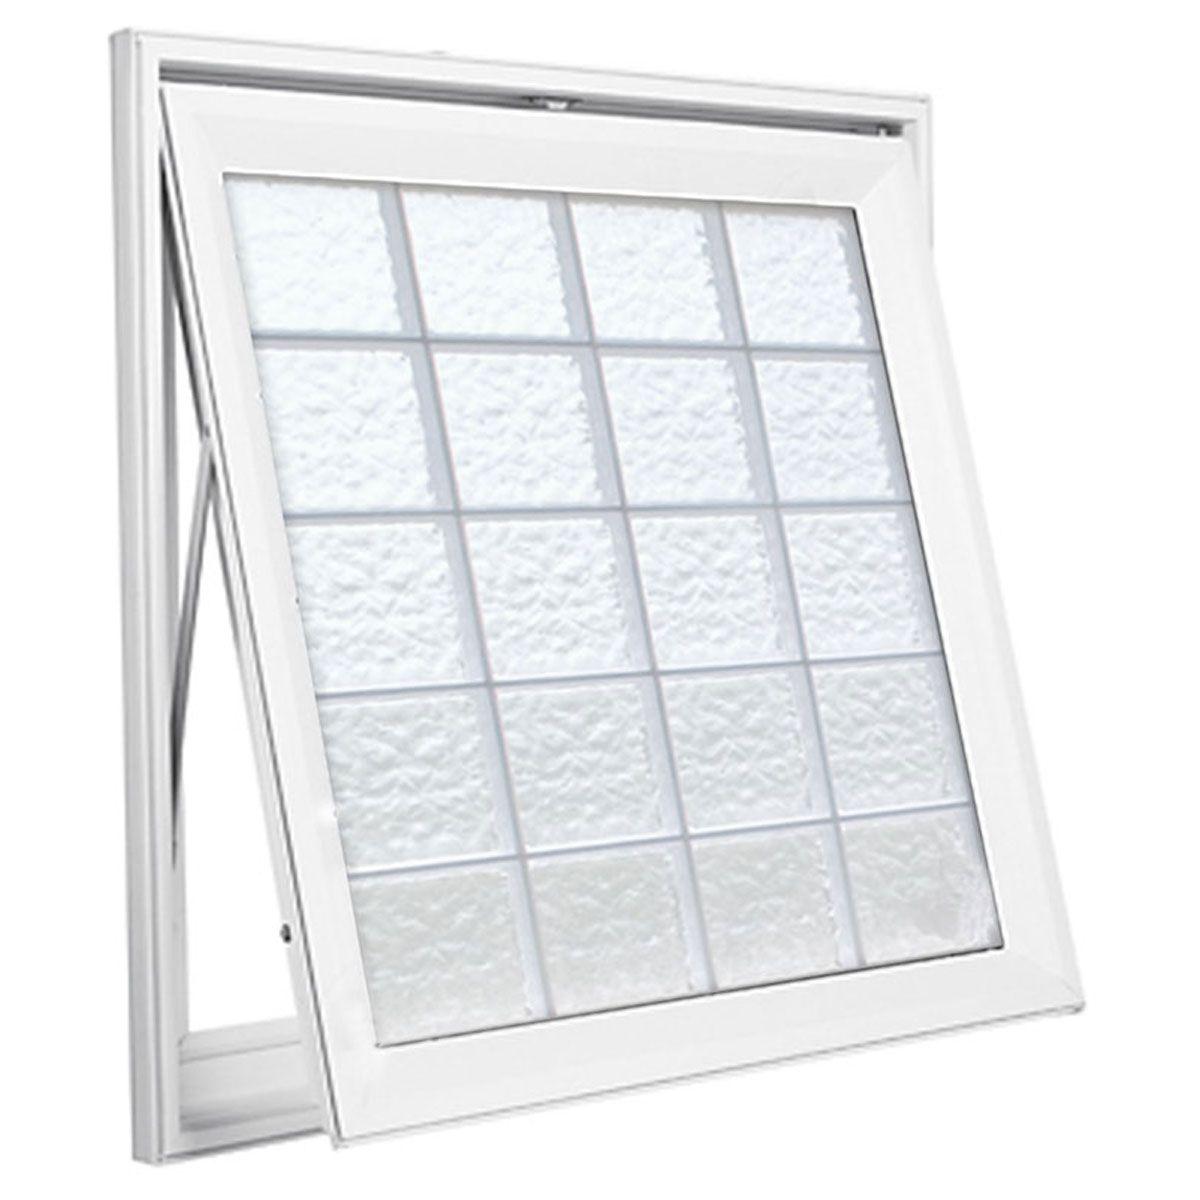 Design Series Awning Windows 6 Inch X 6 Inch X 1 1 2 Inch Blocks Awning Windows Glass Blocks Glass Block Windows